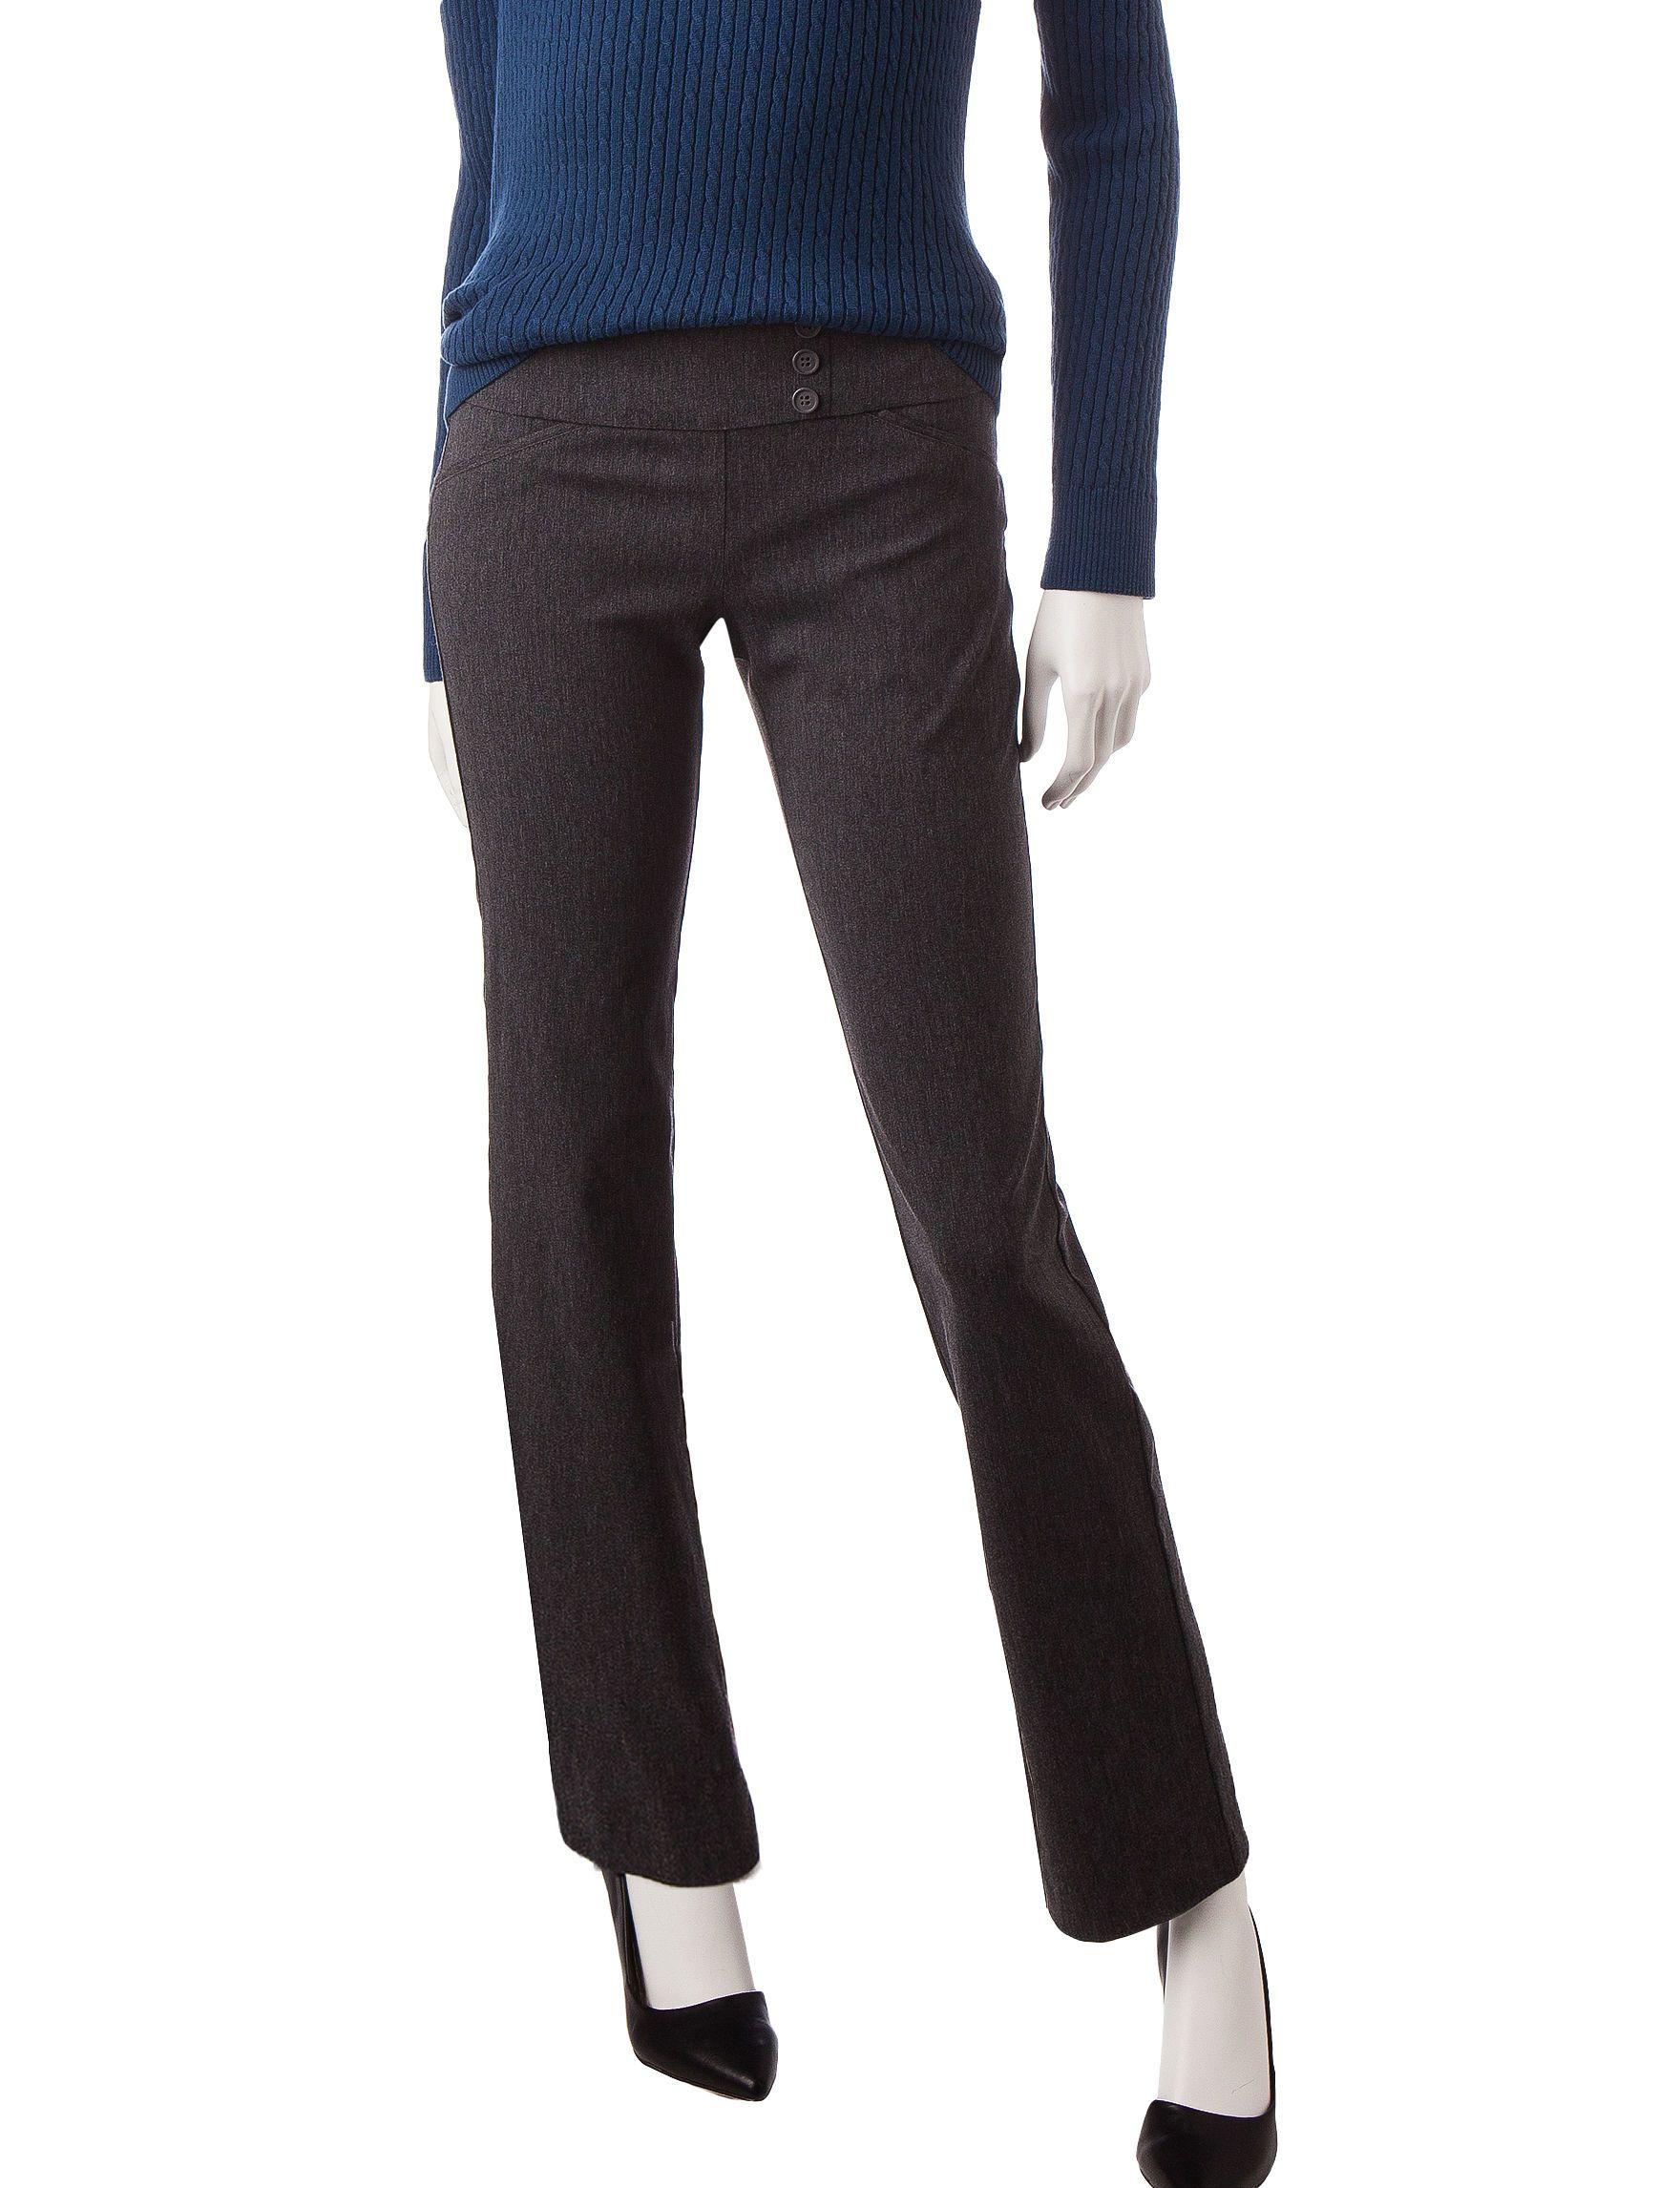 shop today for joe benbasset grey pants u0026 deals on pants official